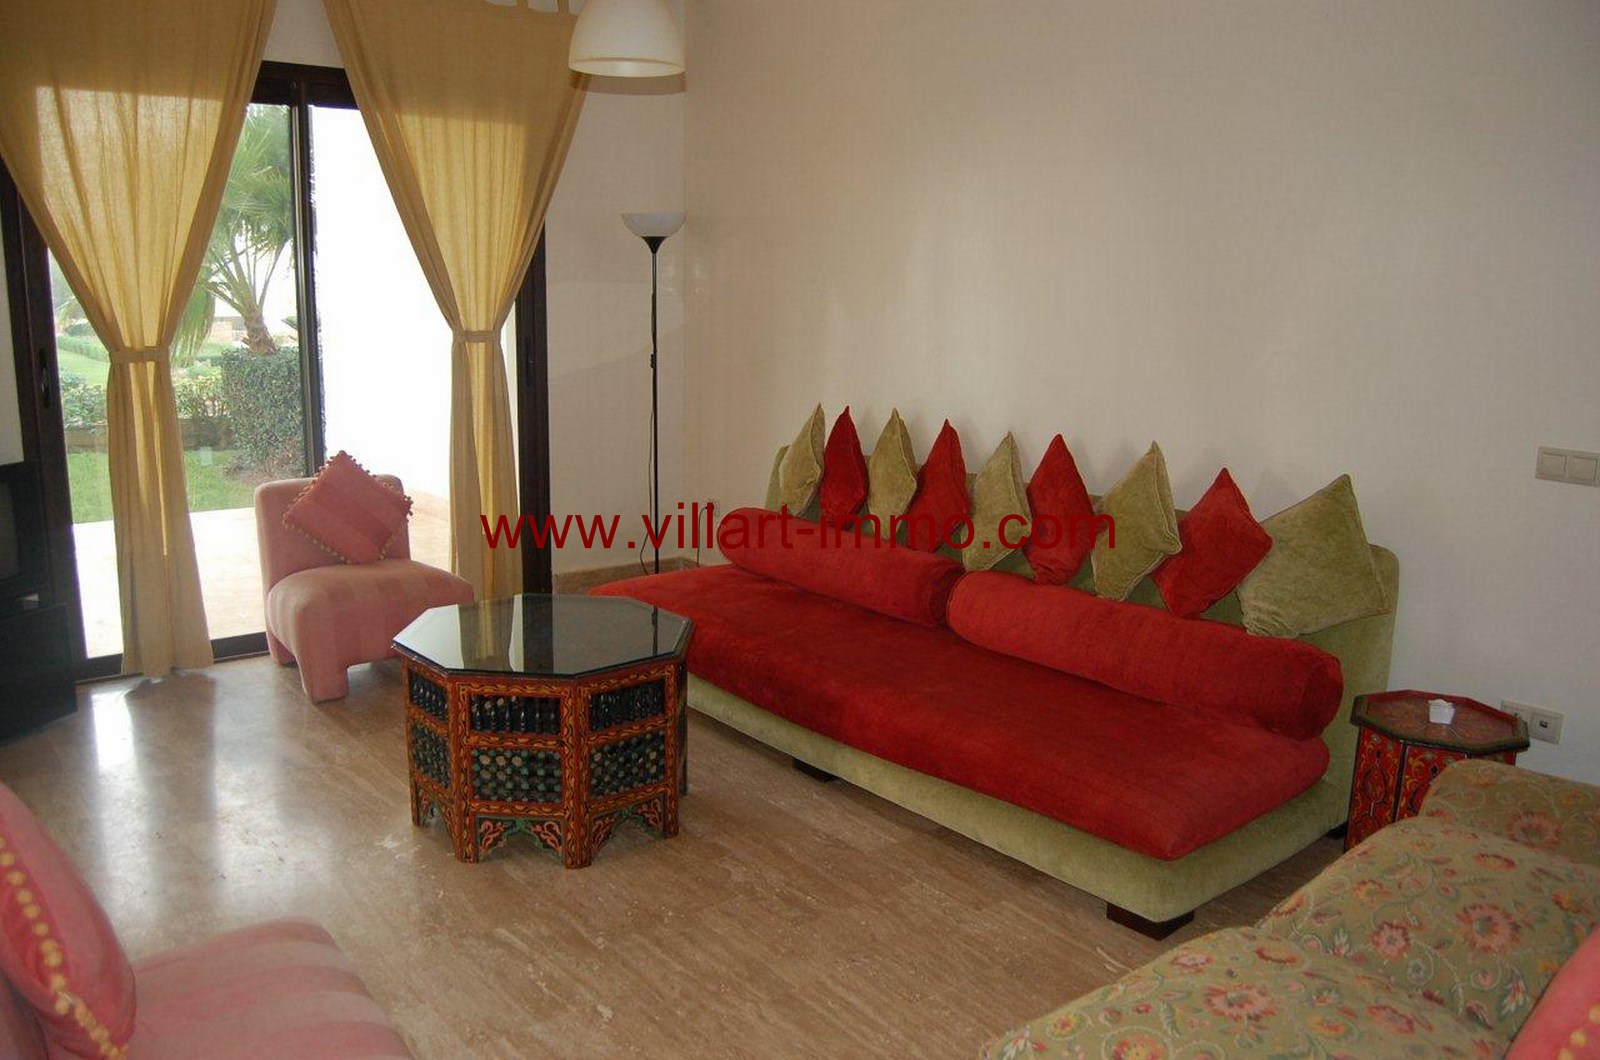 4-vente-appartement-tanger-achakar-salon-1-va390-villart-immo